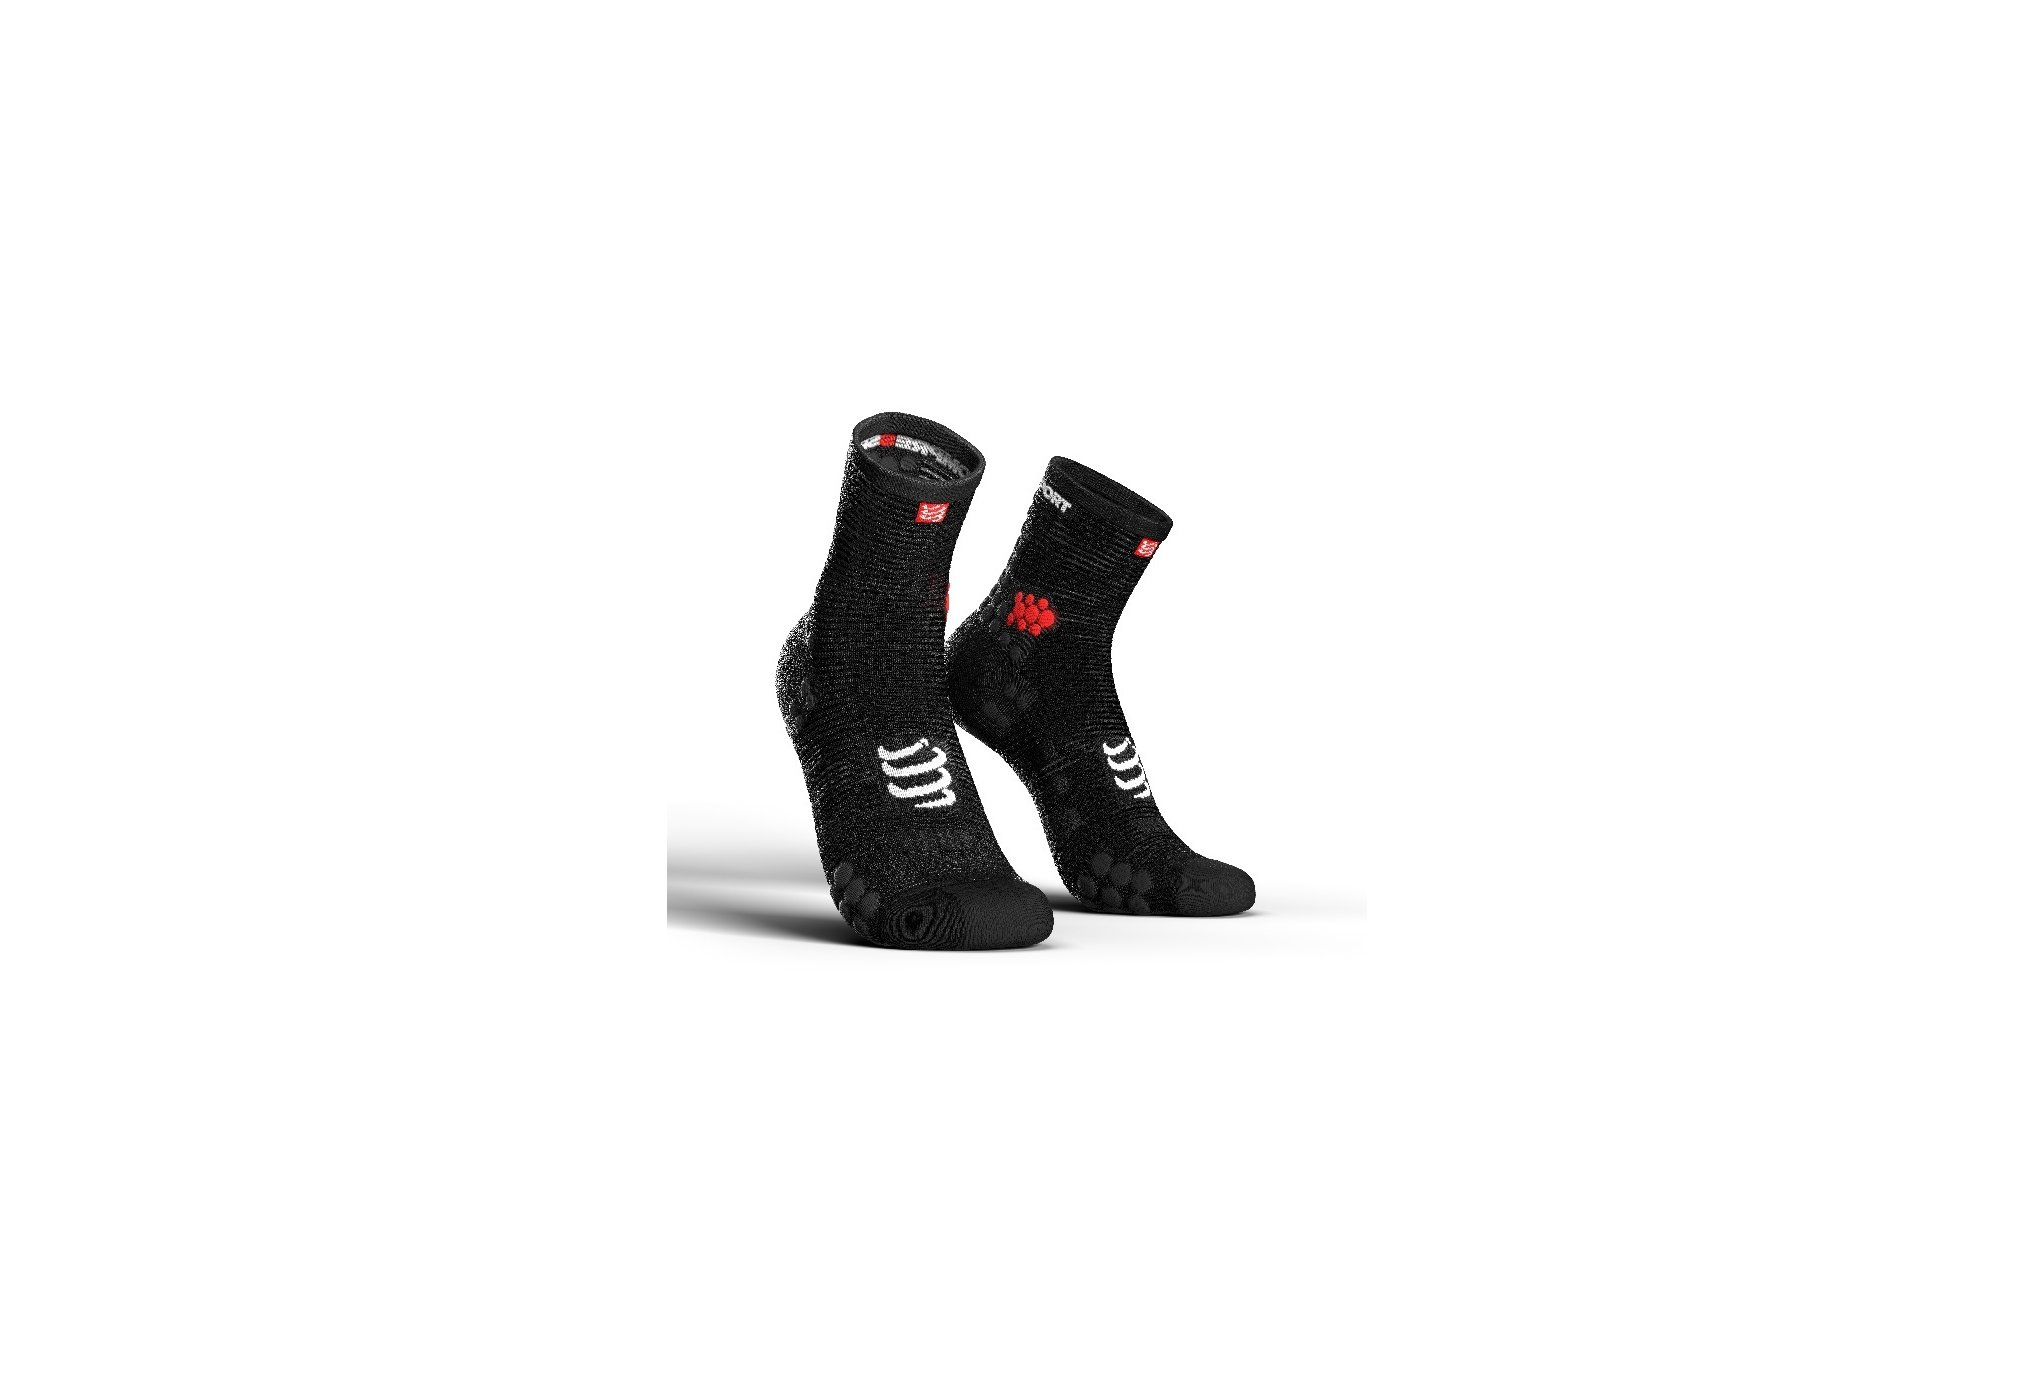 Compressport Pro Racing V 3.0 Run High Chaussettes